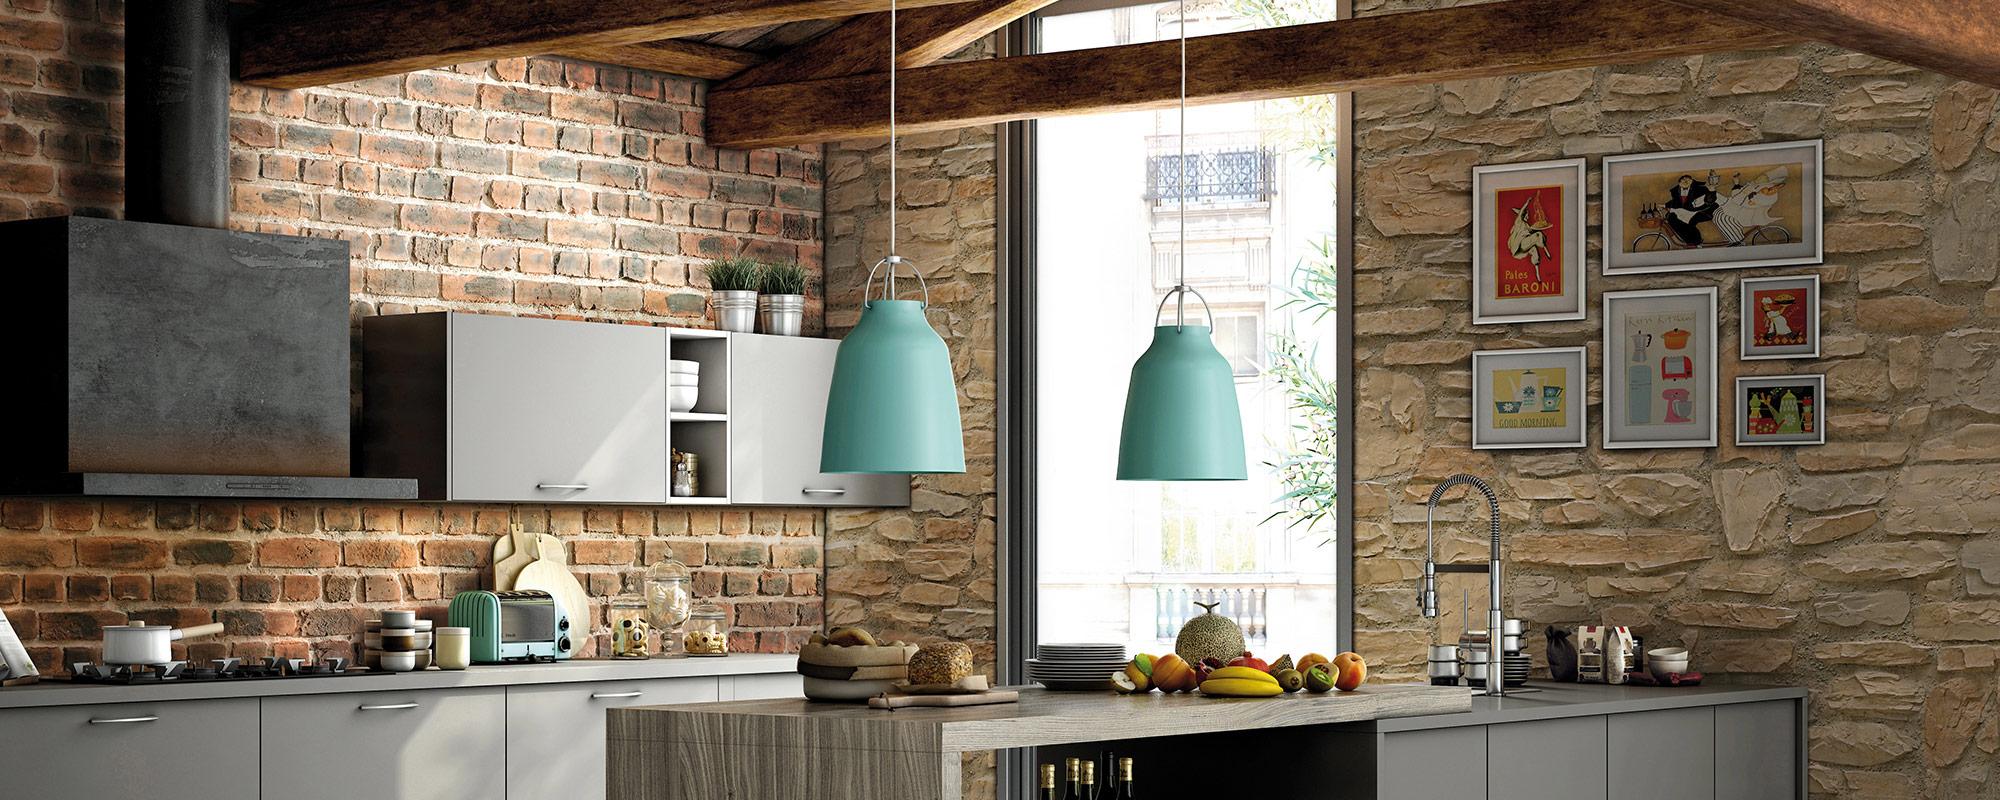 Genial paneles decorativos cocina fotos paneles - Paneles decorativos para cocinas ...